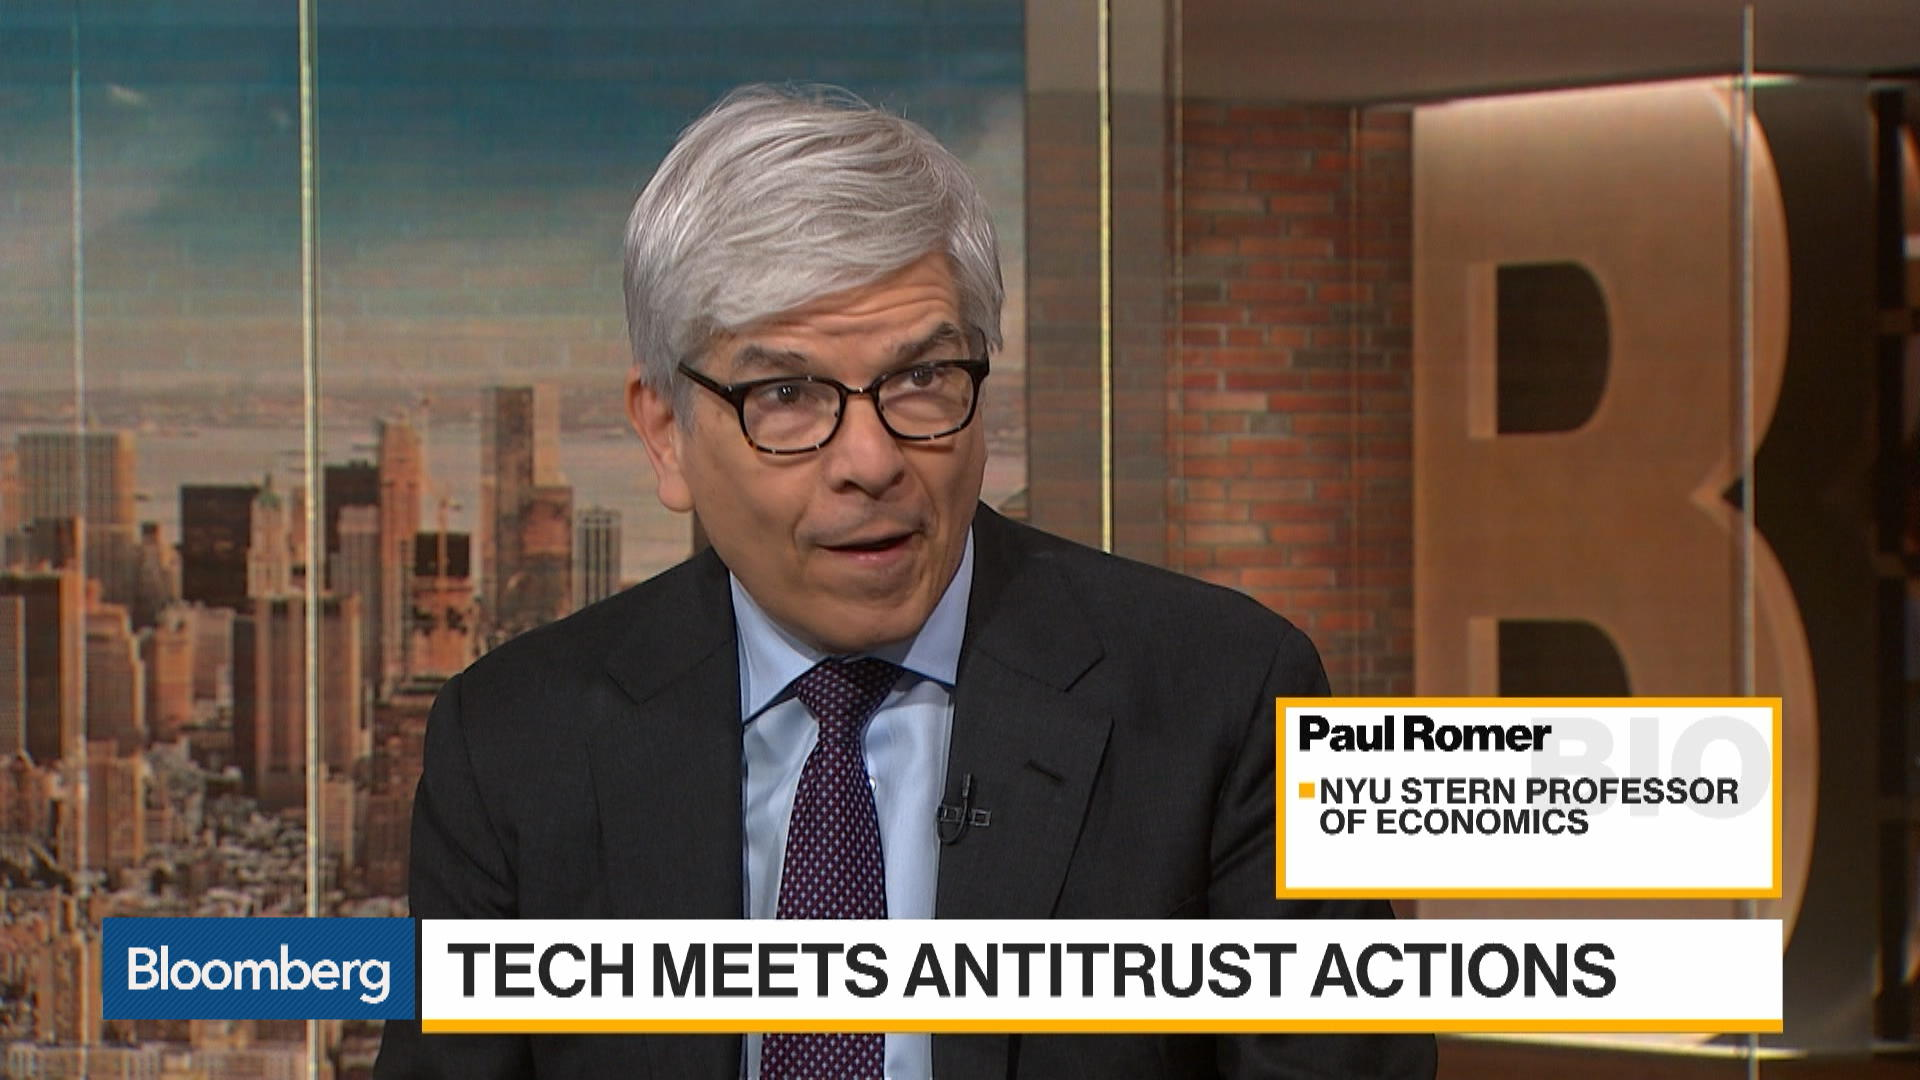 Tech Meets Antitrust Actions